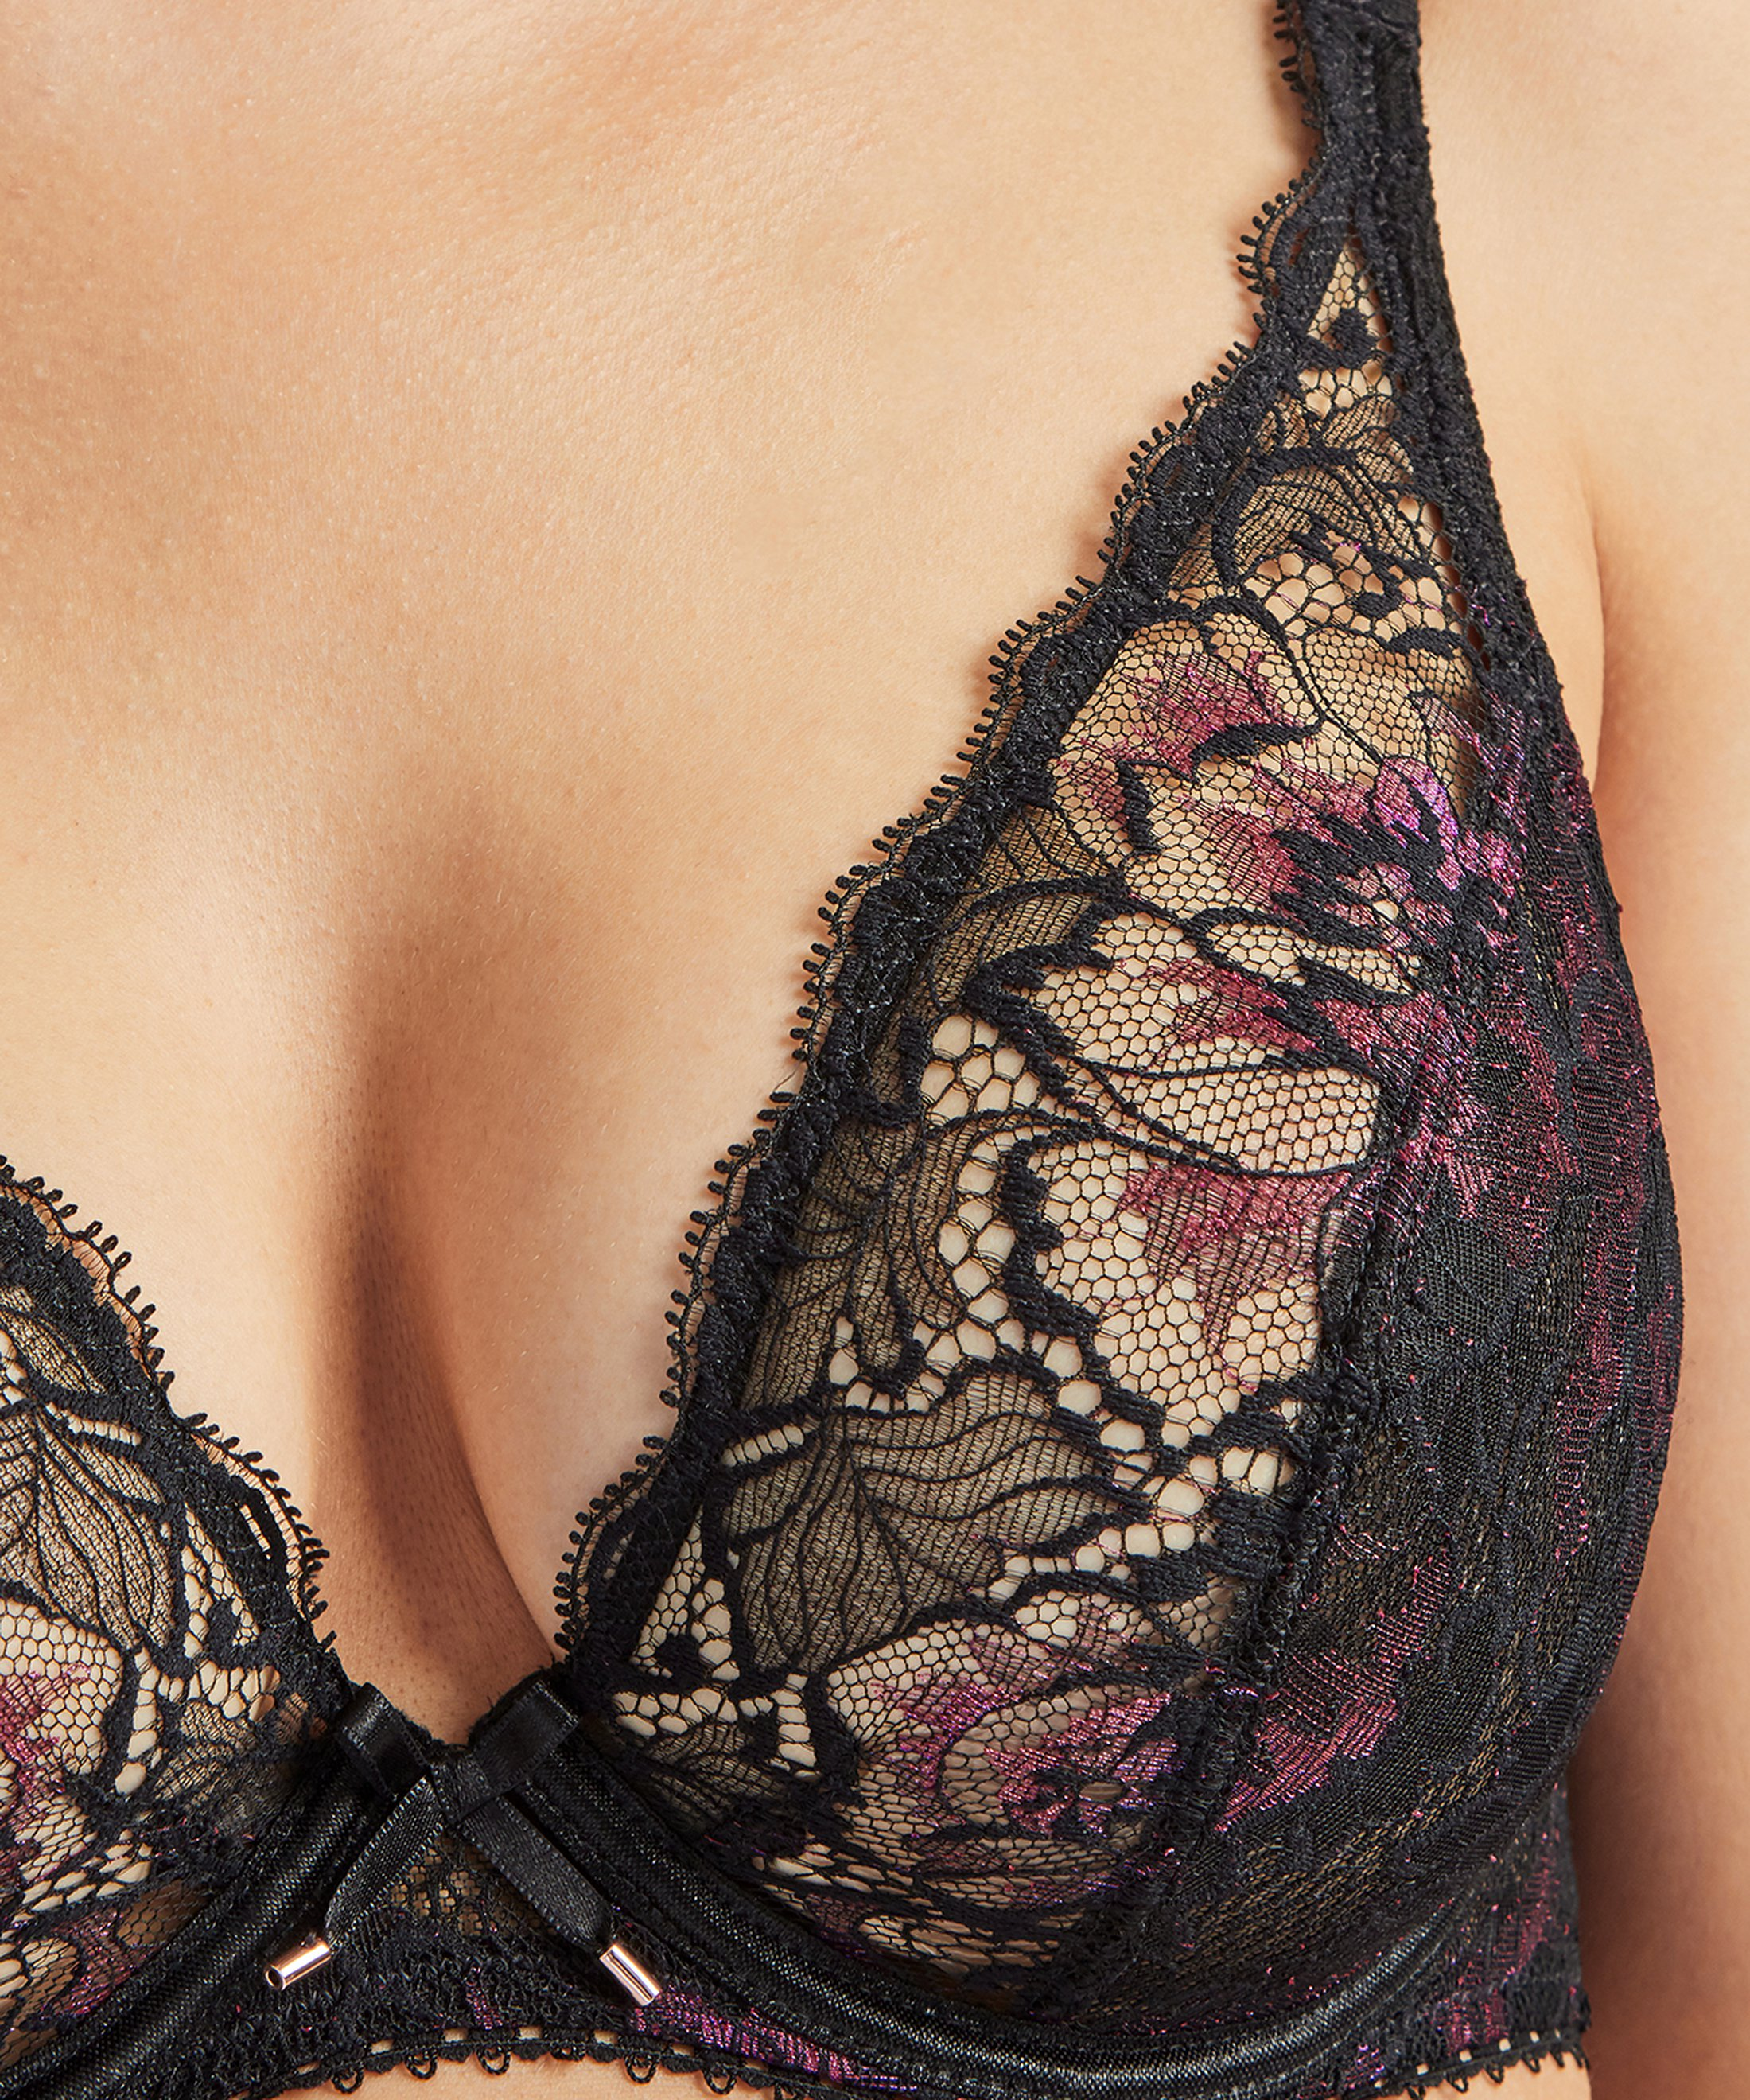 AUBE AMOUREUSE Soutien-gorge triangle avec armatures Violetta | Aubade